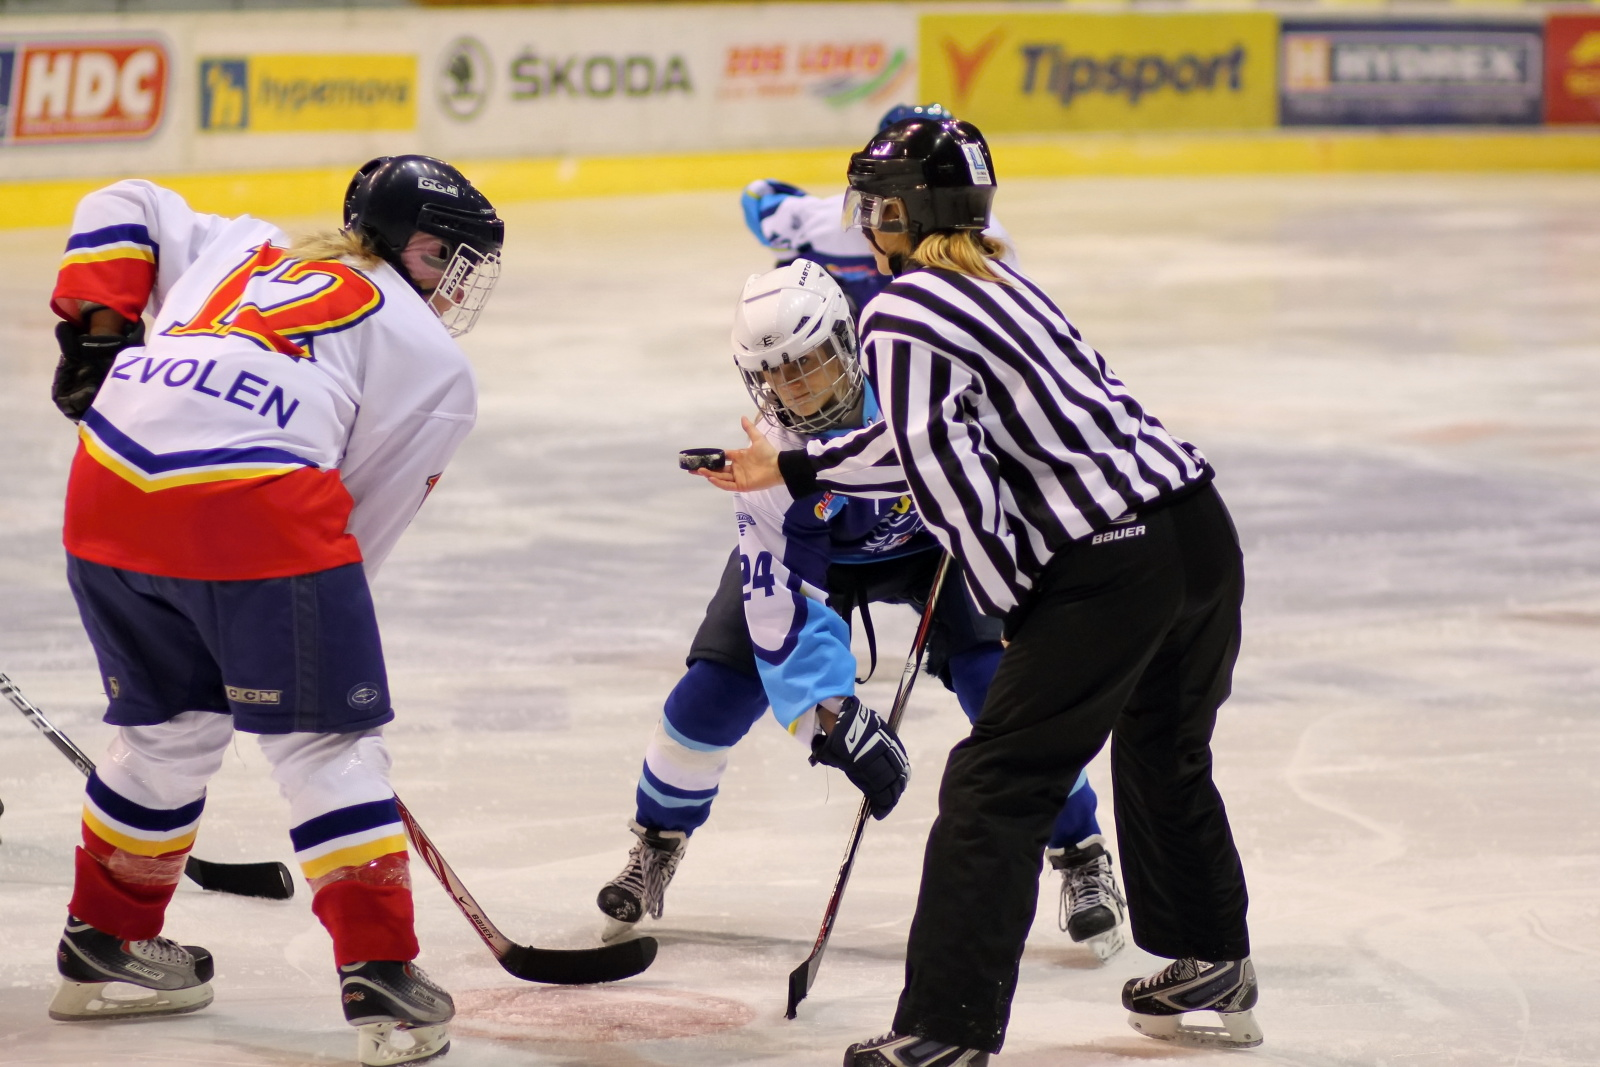 zhkm-zvolen-martin-hokej-2011-9